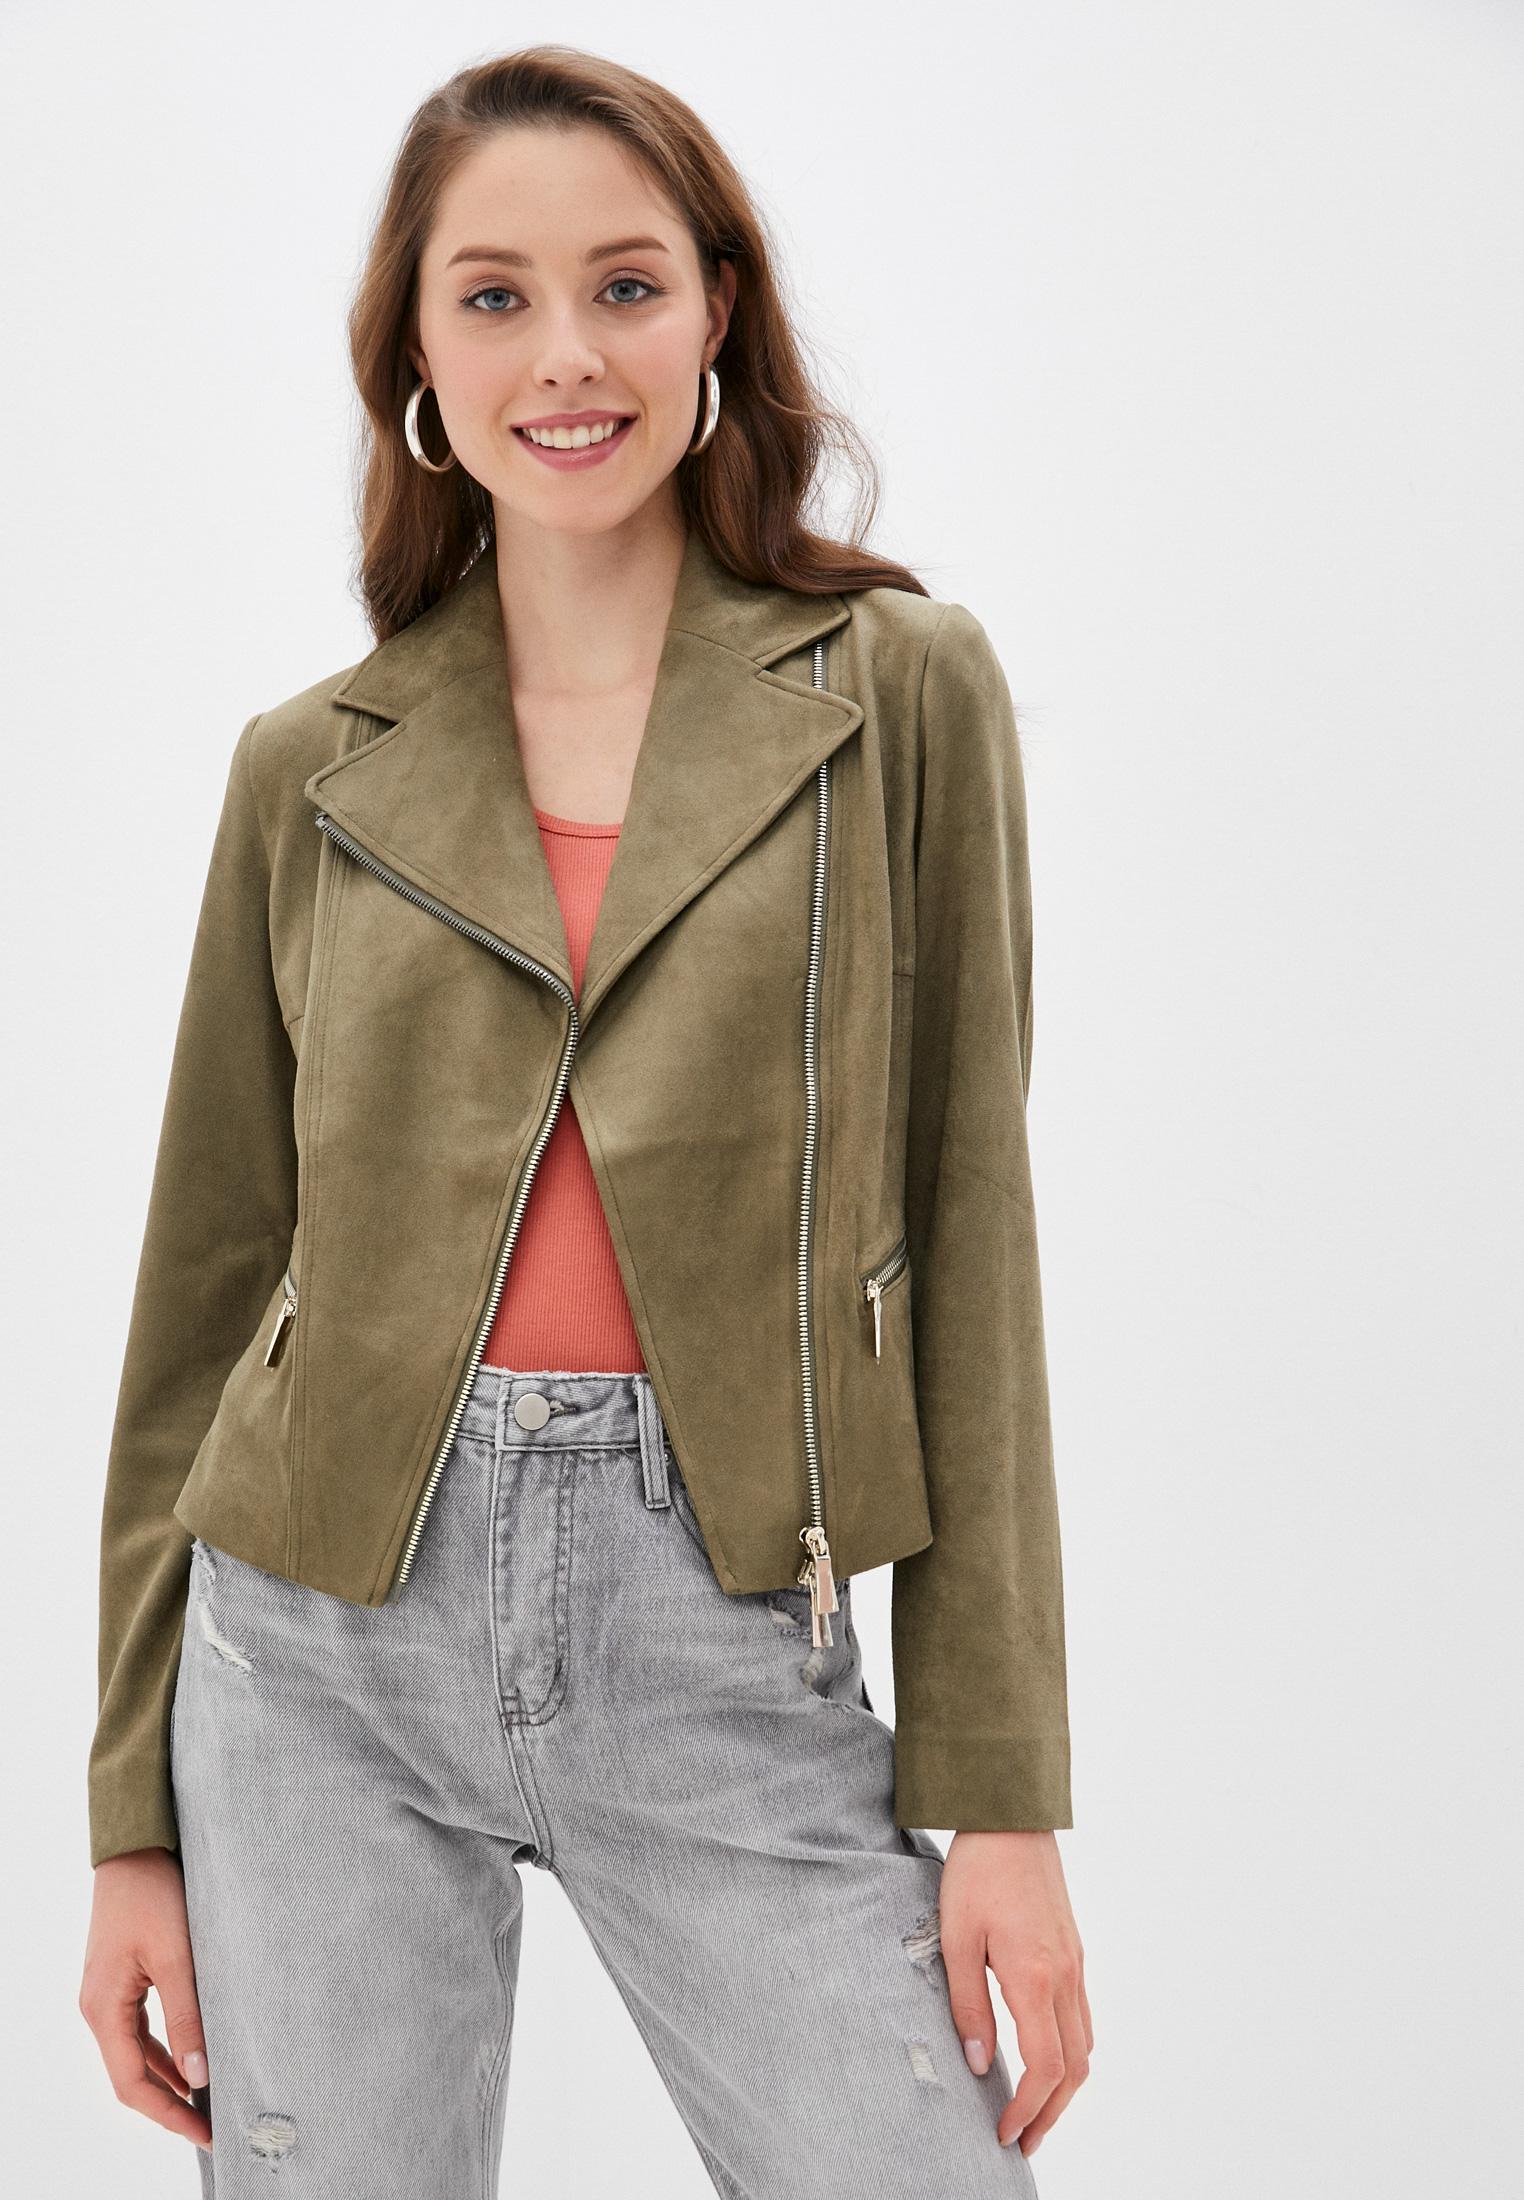 Кожаная куртка Betty Barclay Куртка кожаная Betty Barclay